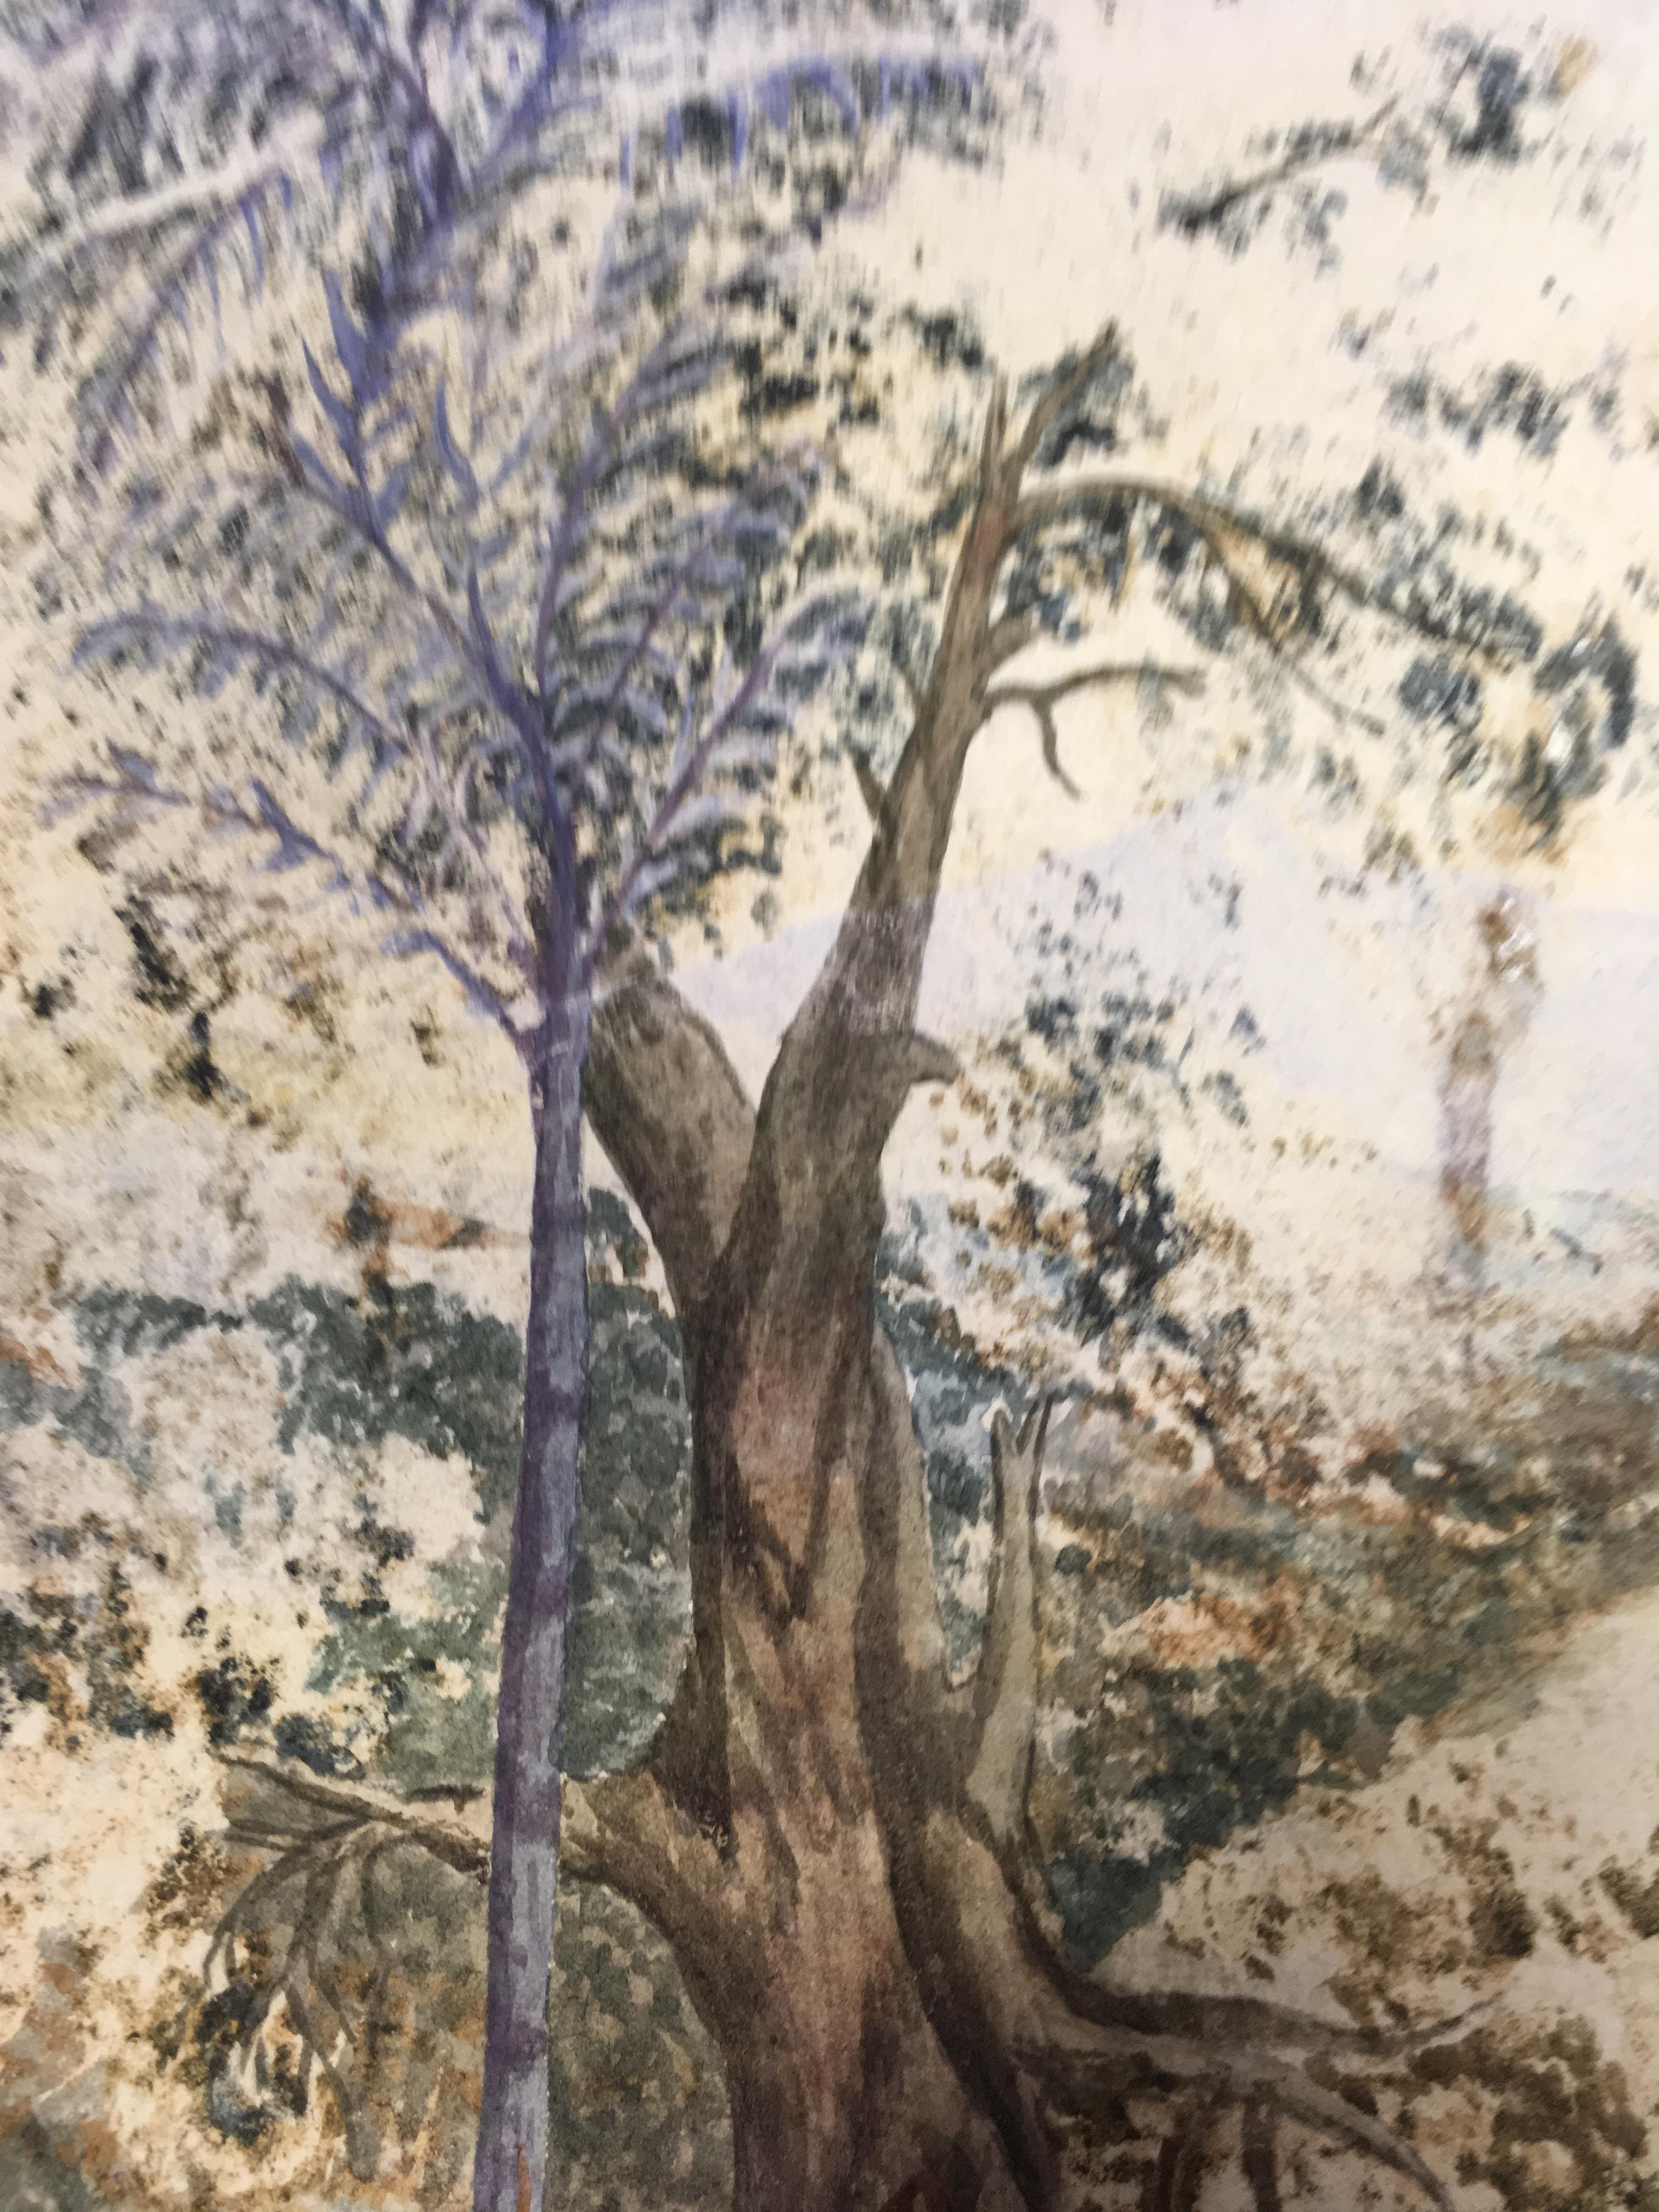 Lot 168 - COLONIAL SCHOOL (19th CENTURY) AN EASTERN RIVER watercolour 26.5 x 44.5cm / 10 1/2 x 17 1/2in It has